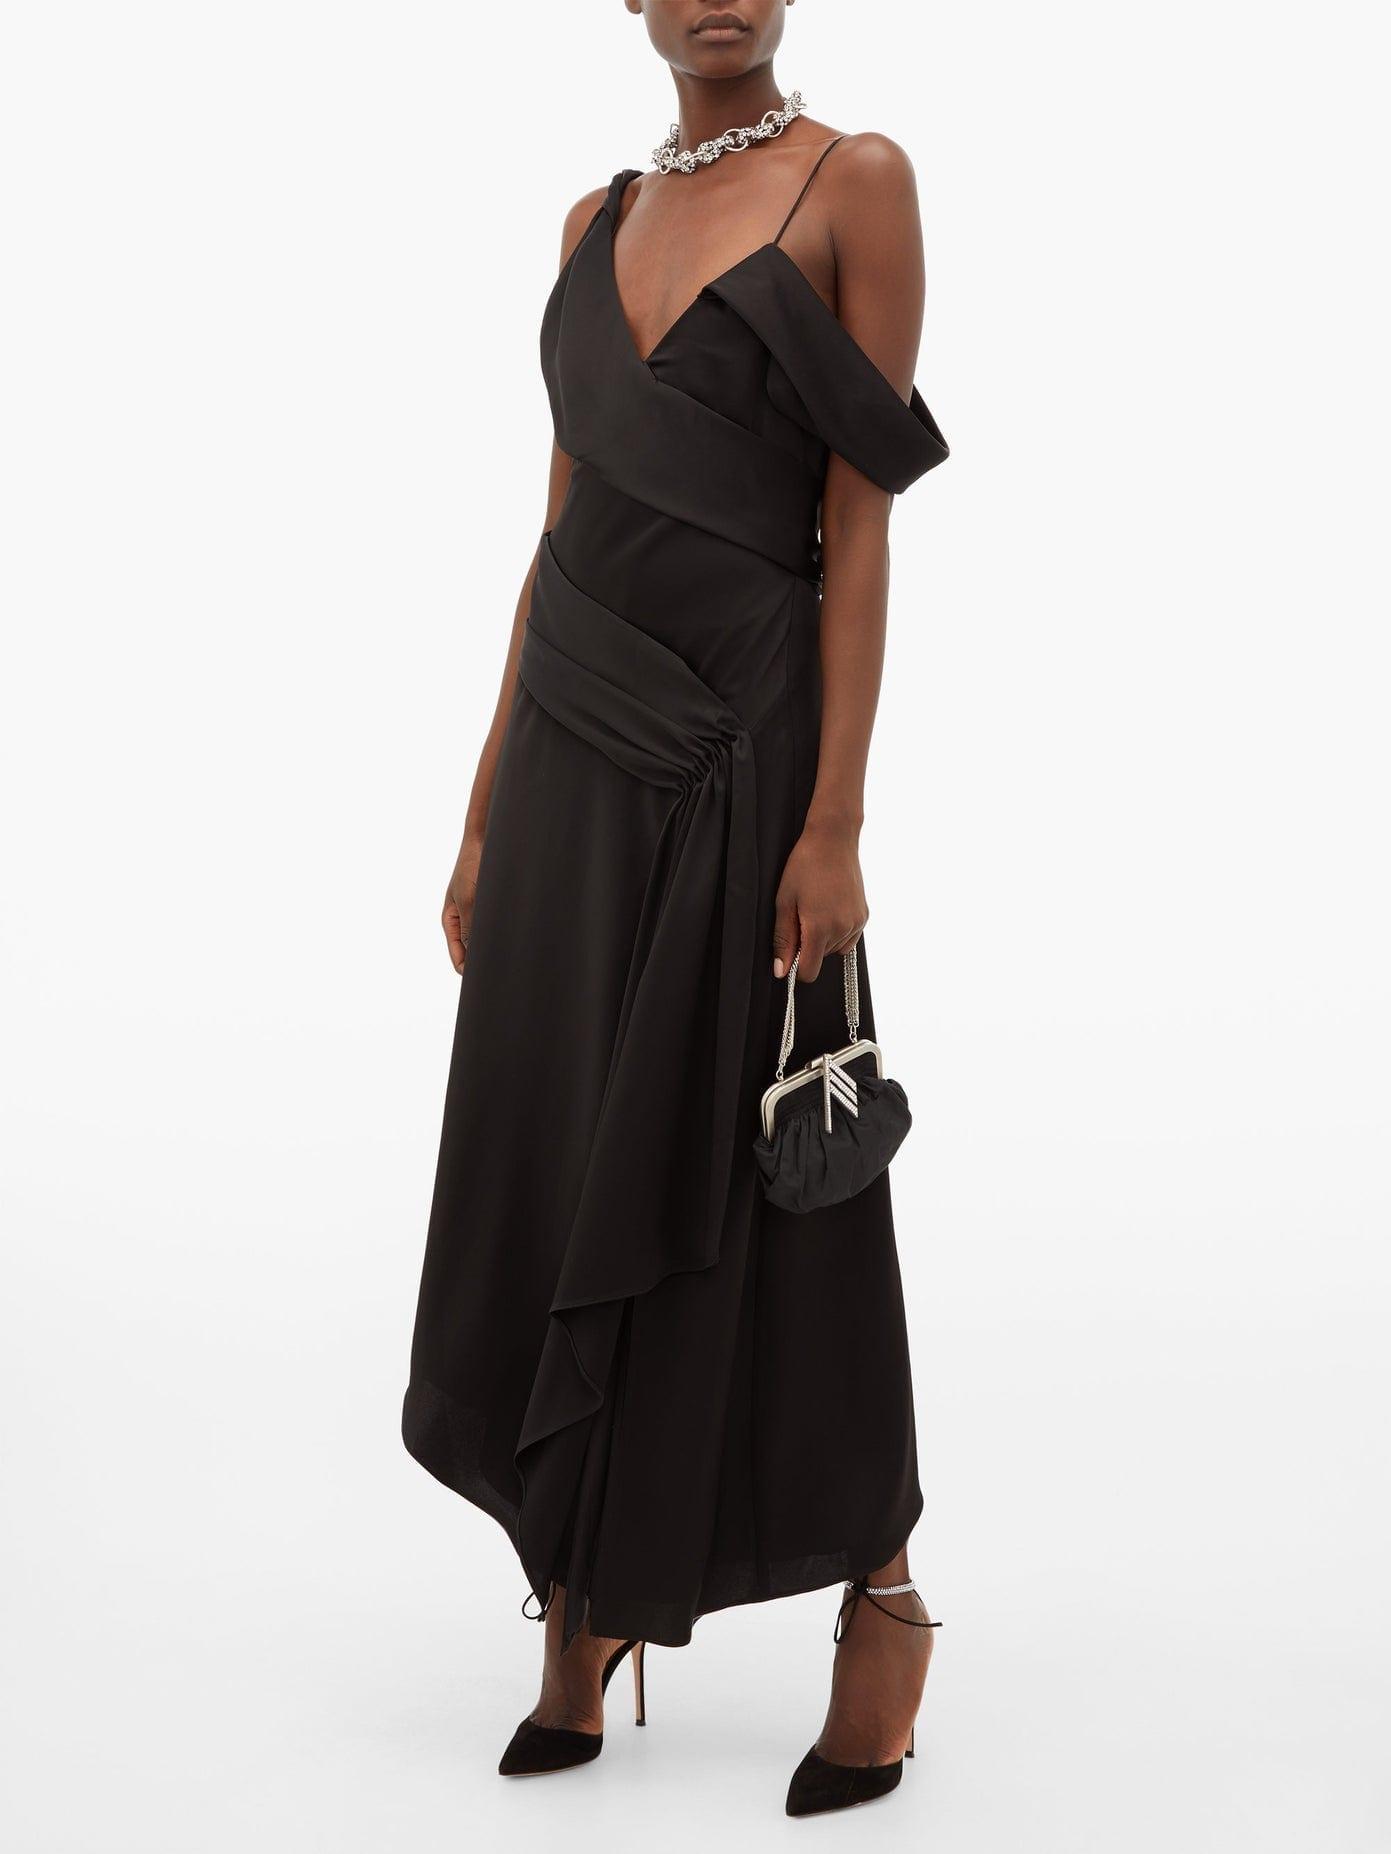 JONATHAN SIMKHAI Satin Asymmetric Draped Midi Dress